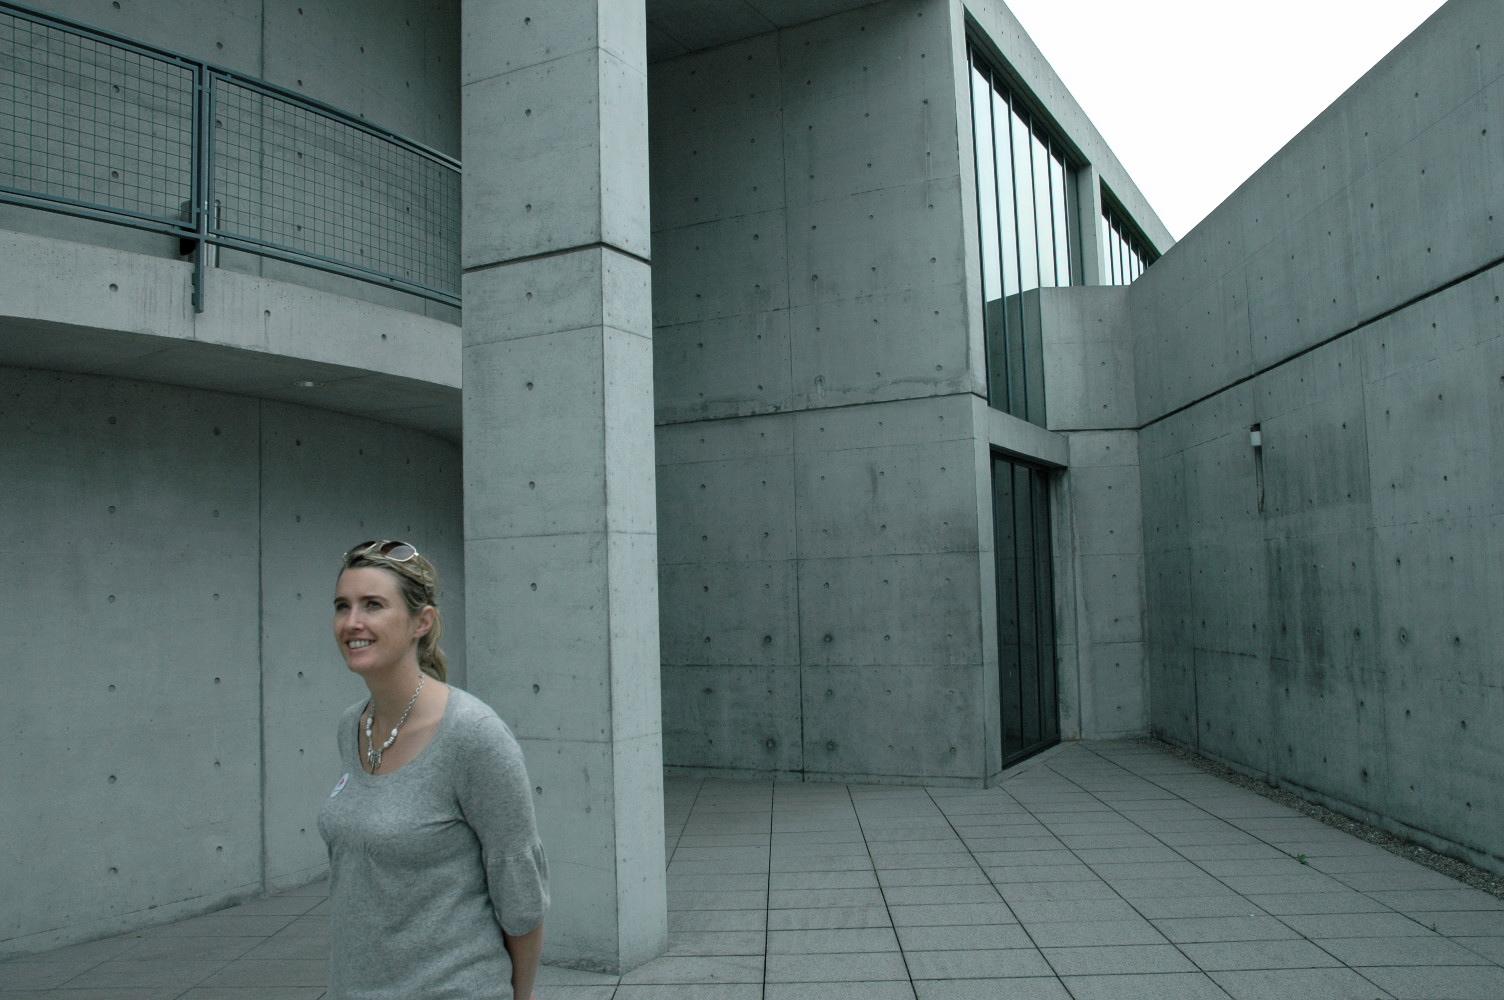 Lisa admiring the work of Tadao Ando at Vitra Campus, Germany